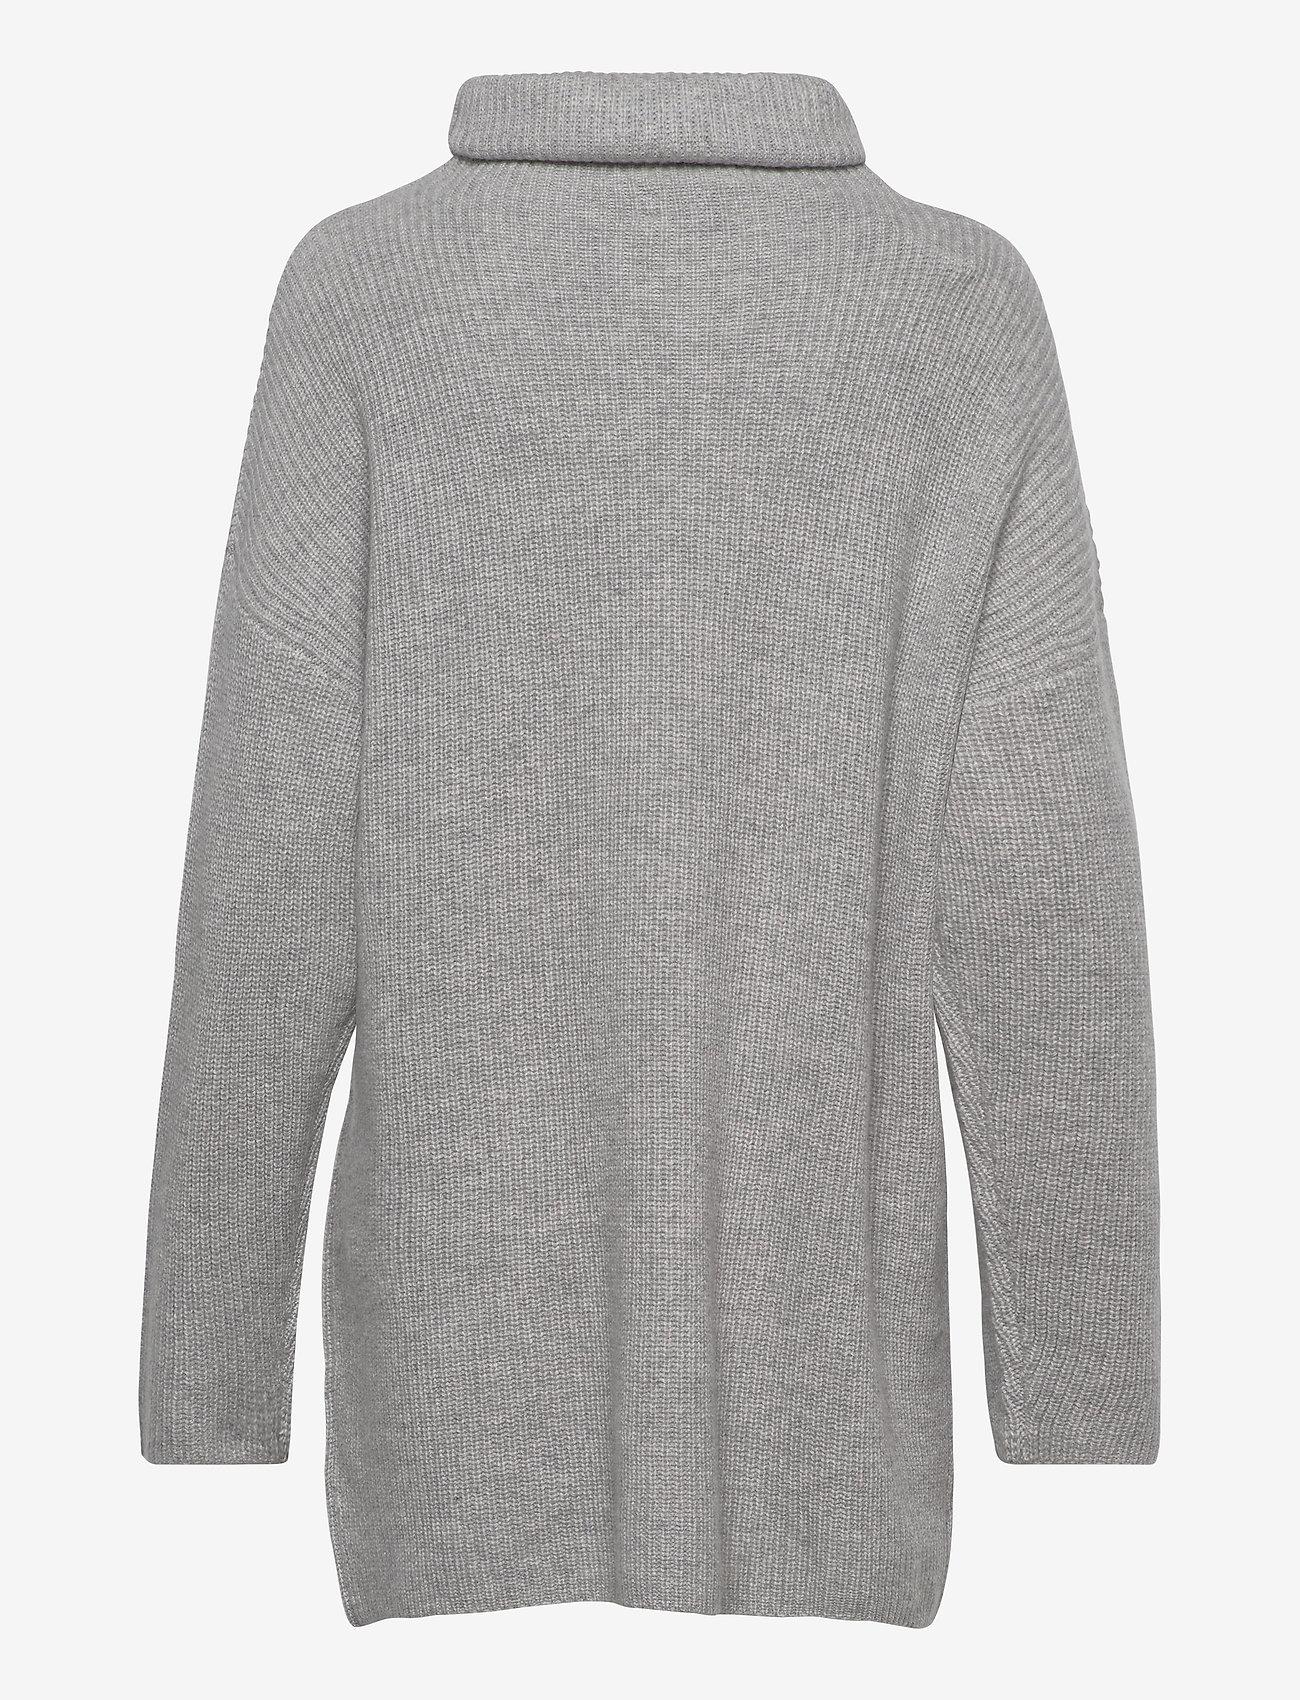 Davida Cashmere - Oversized Rib Sweater - cashmere - light grey - 1